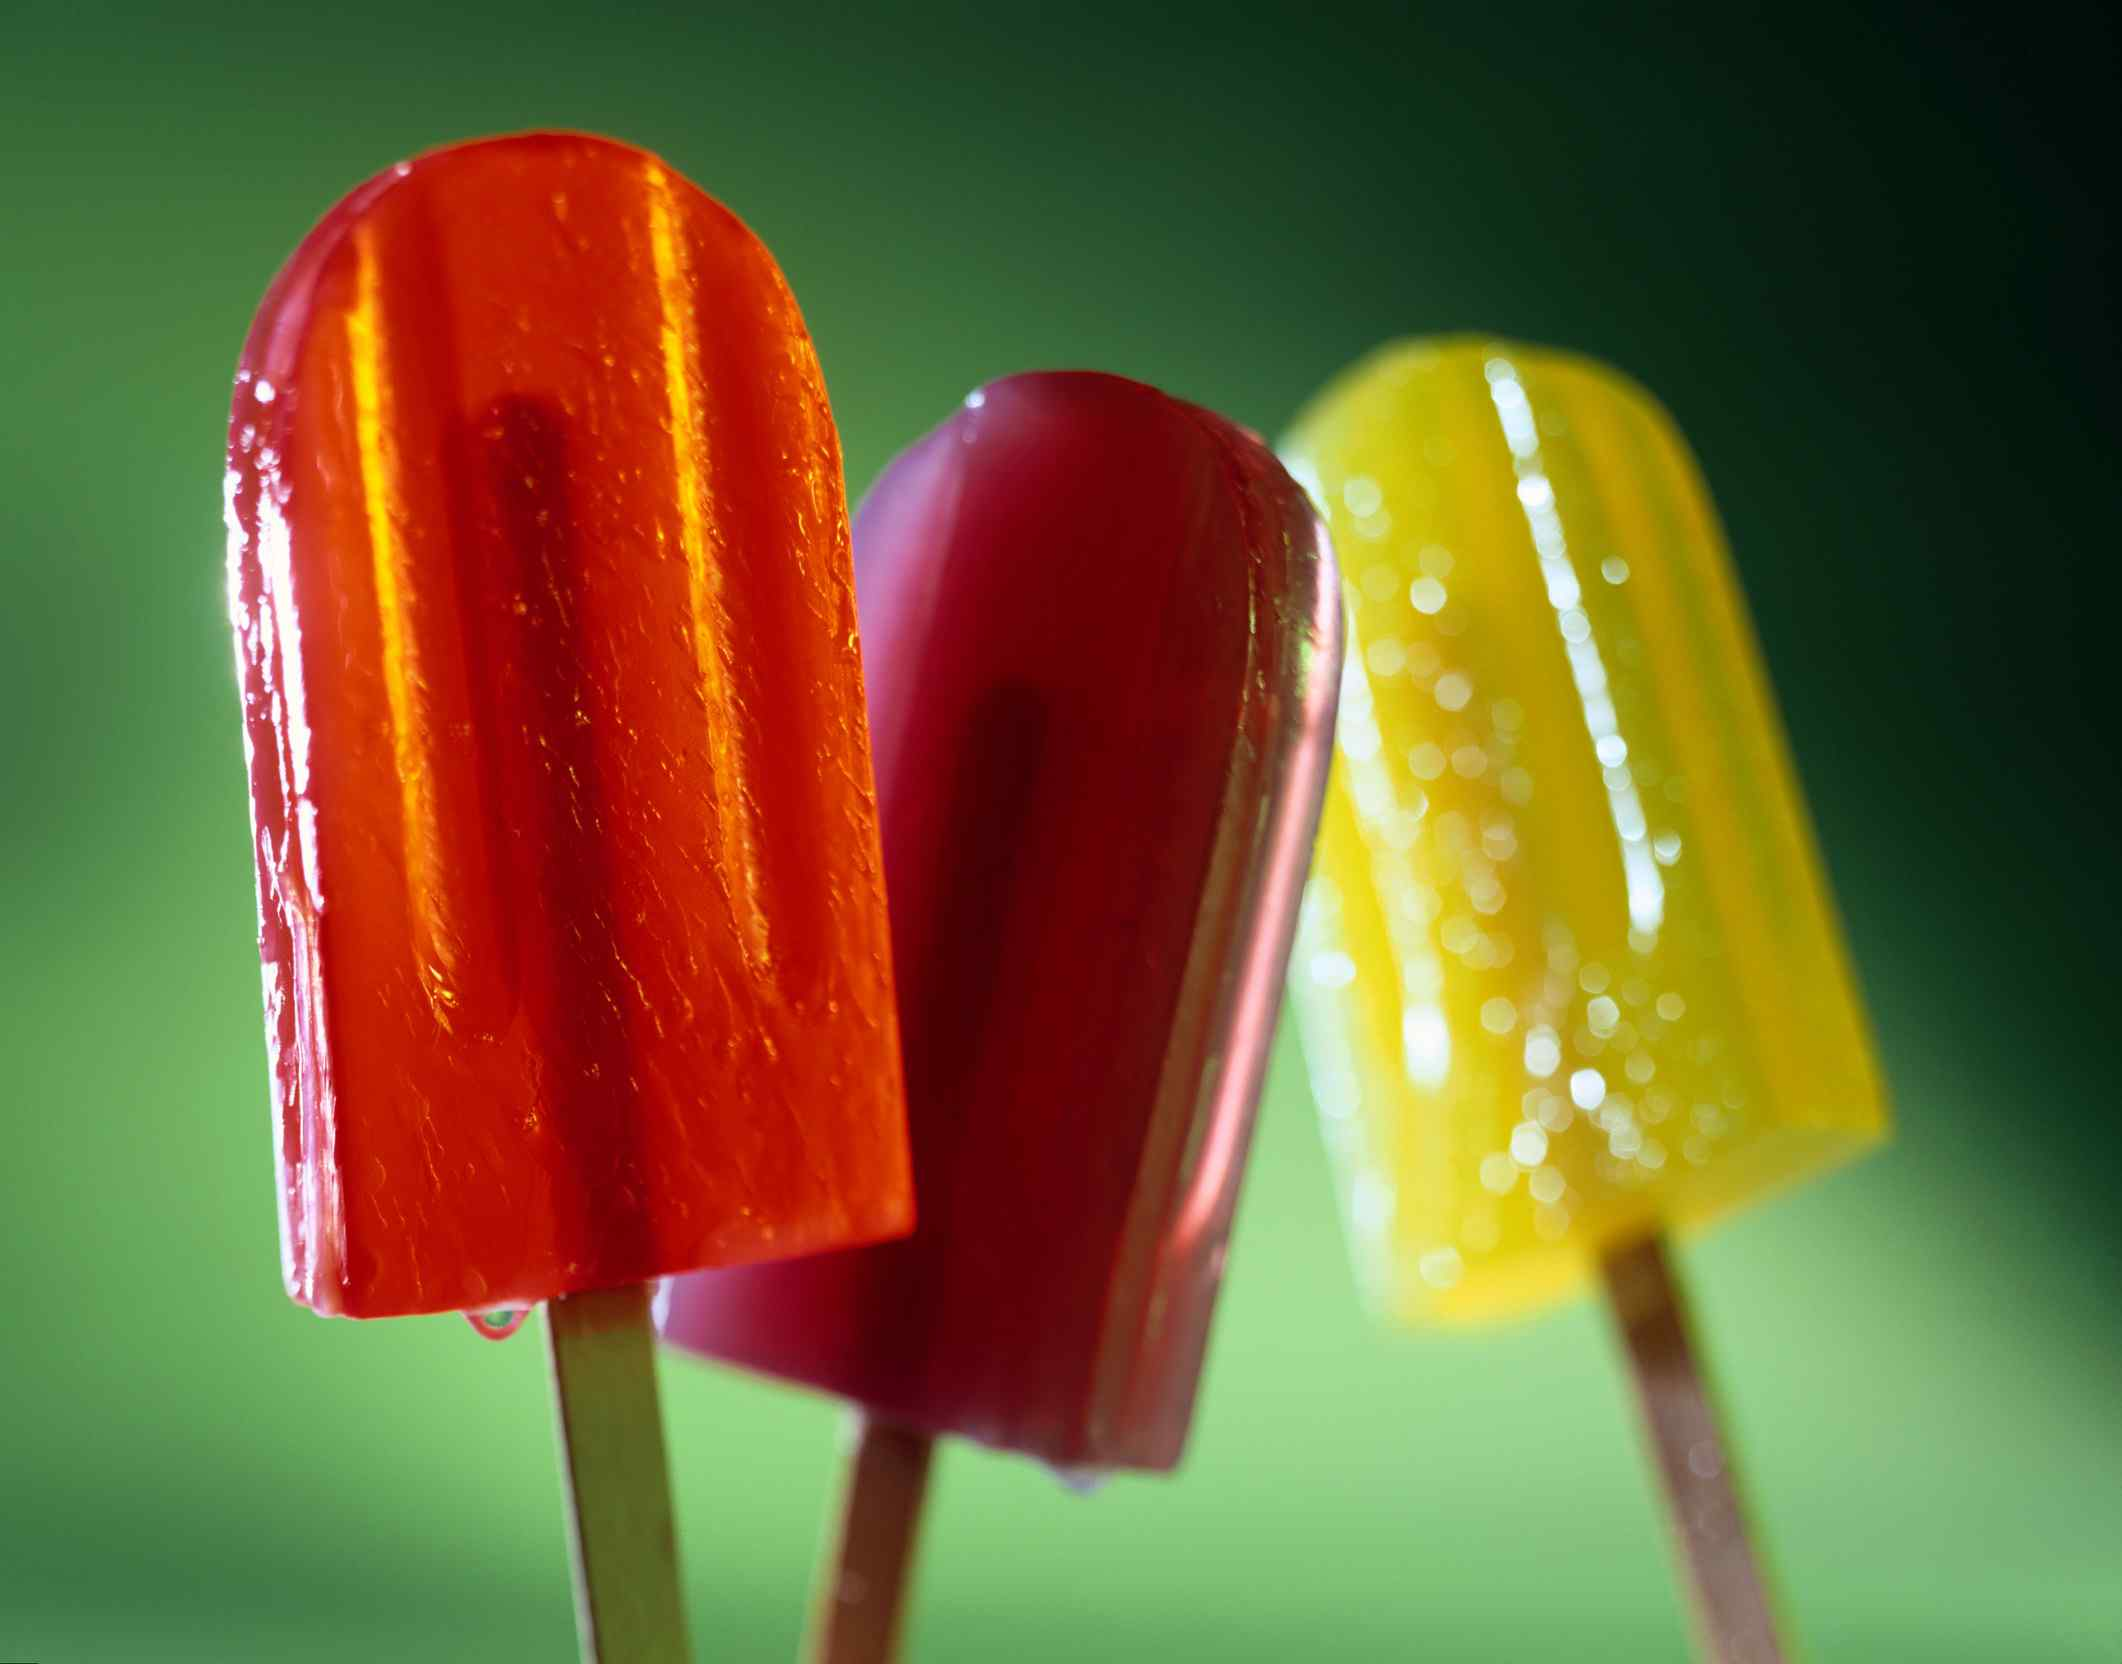 Мороженое или лед своими руками